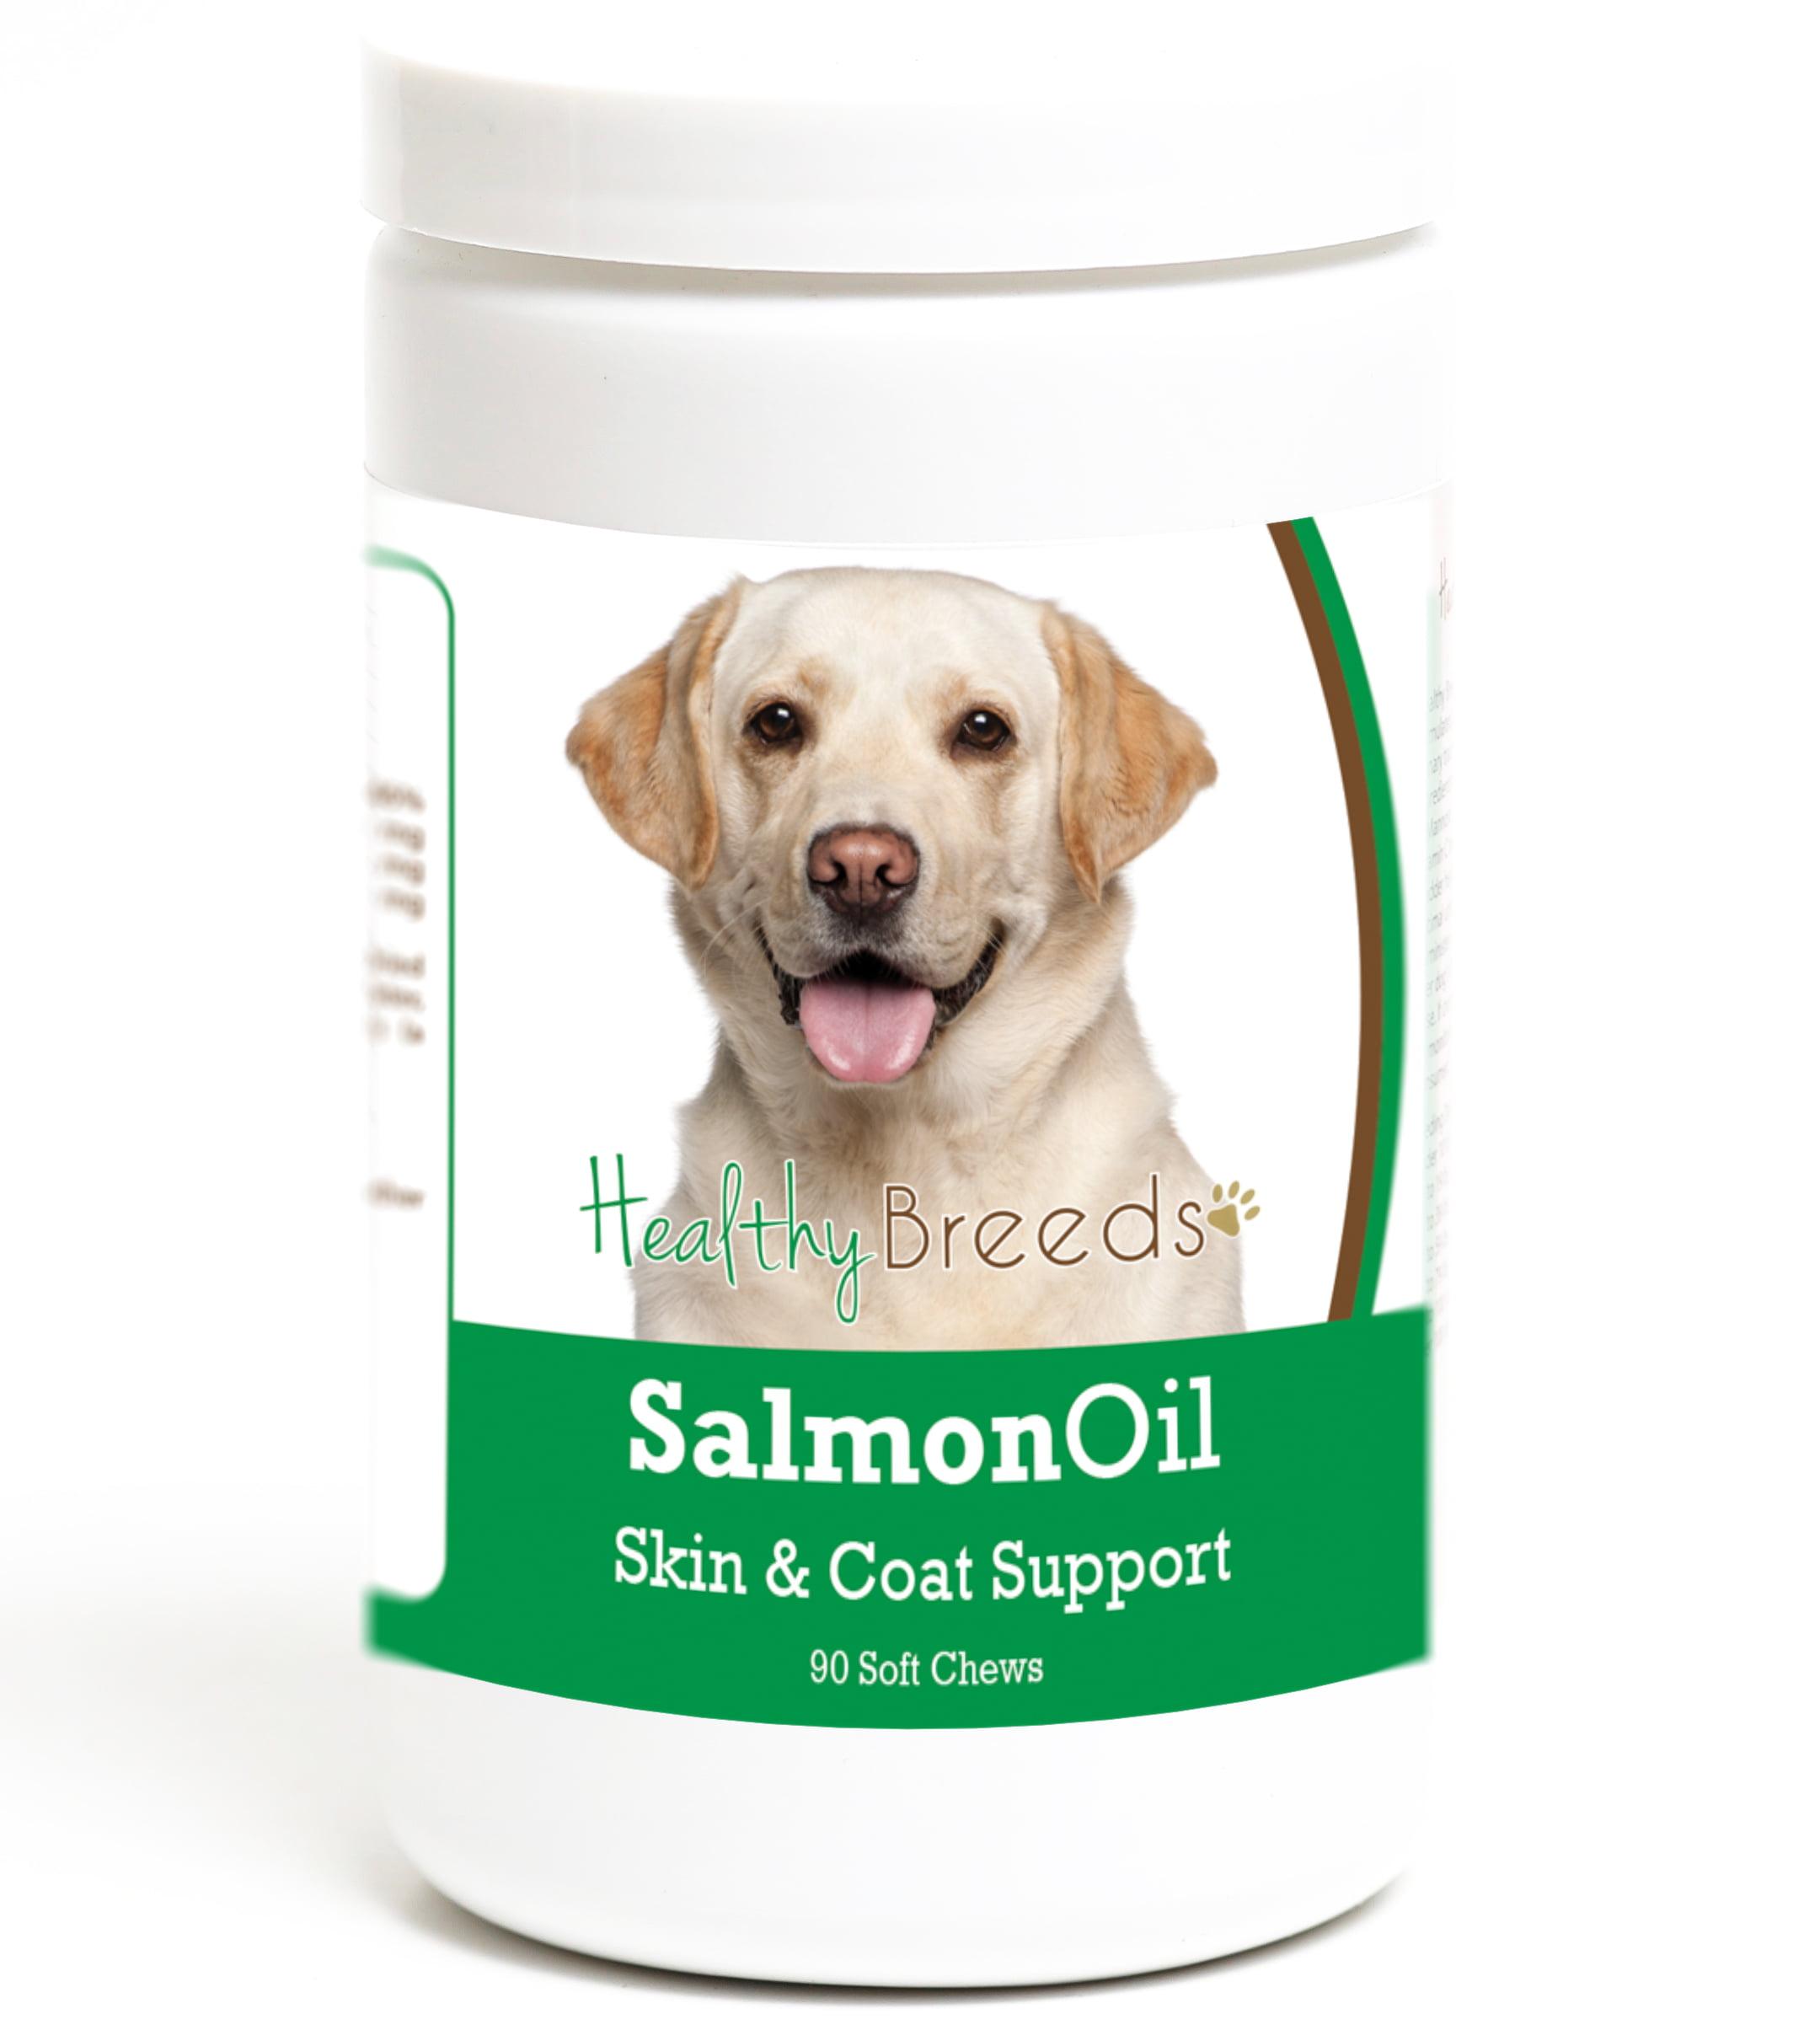 Healthy Breeds Labrador Retriever Salmon Oil Soft Chews 90 Count